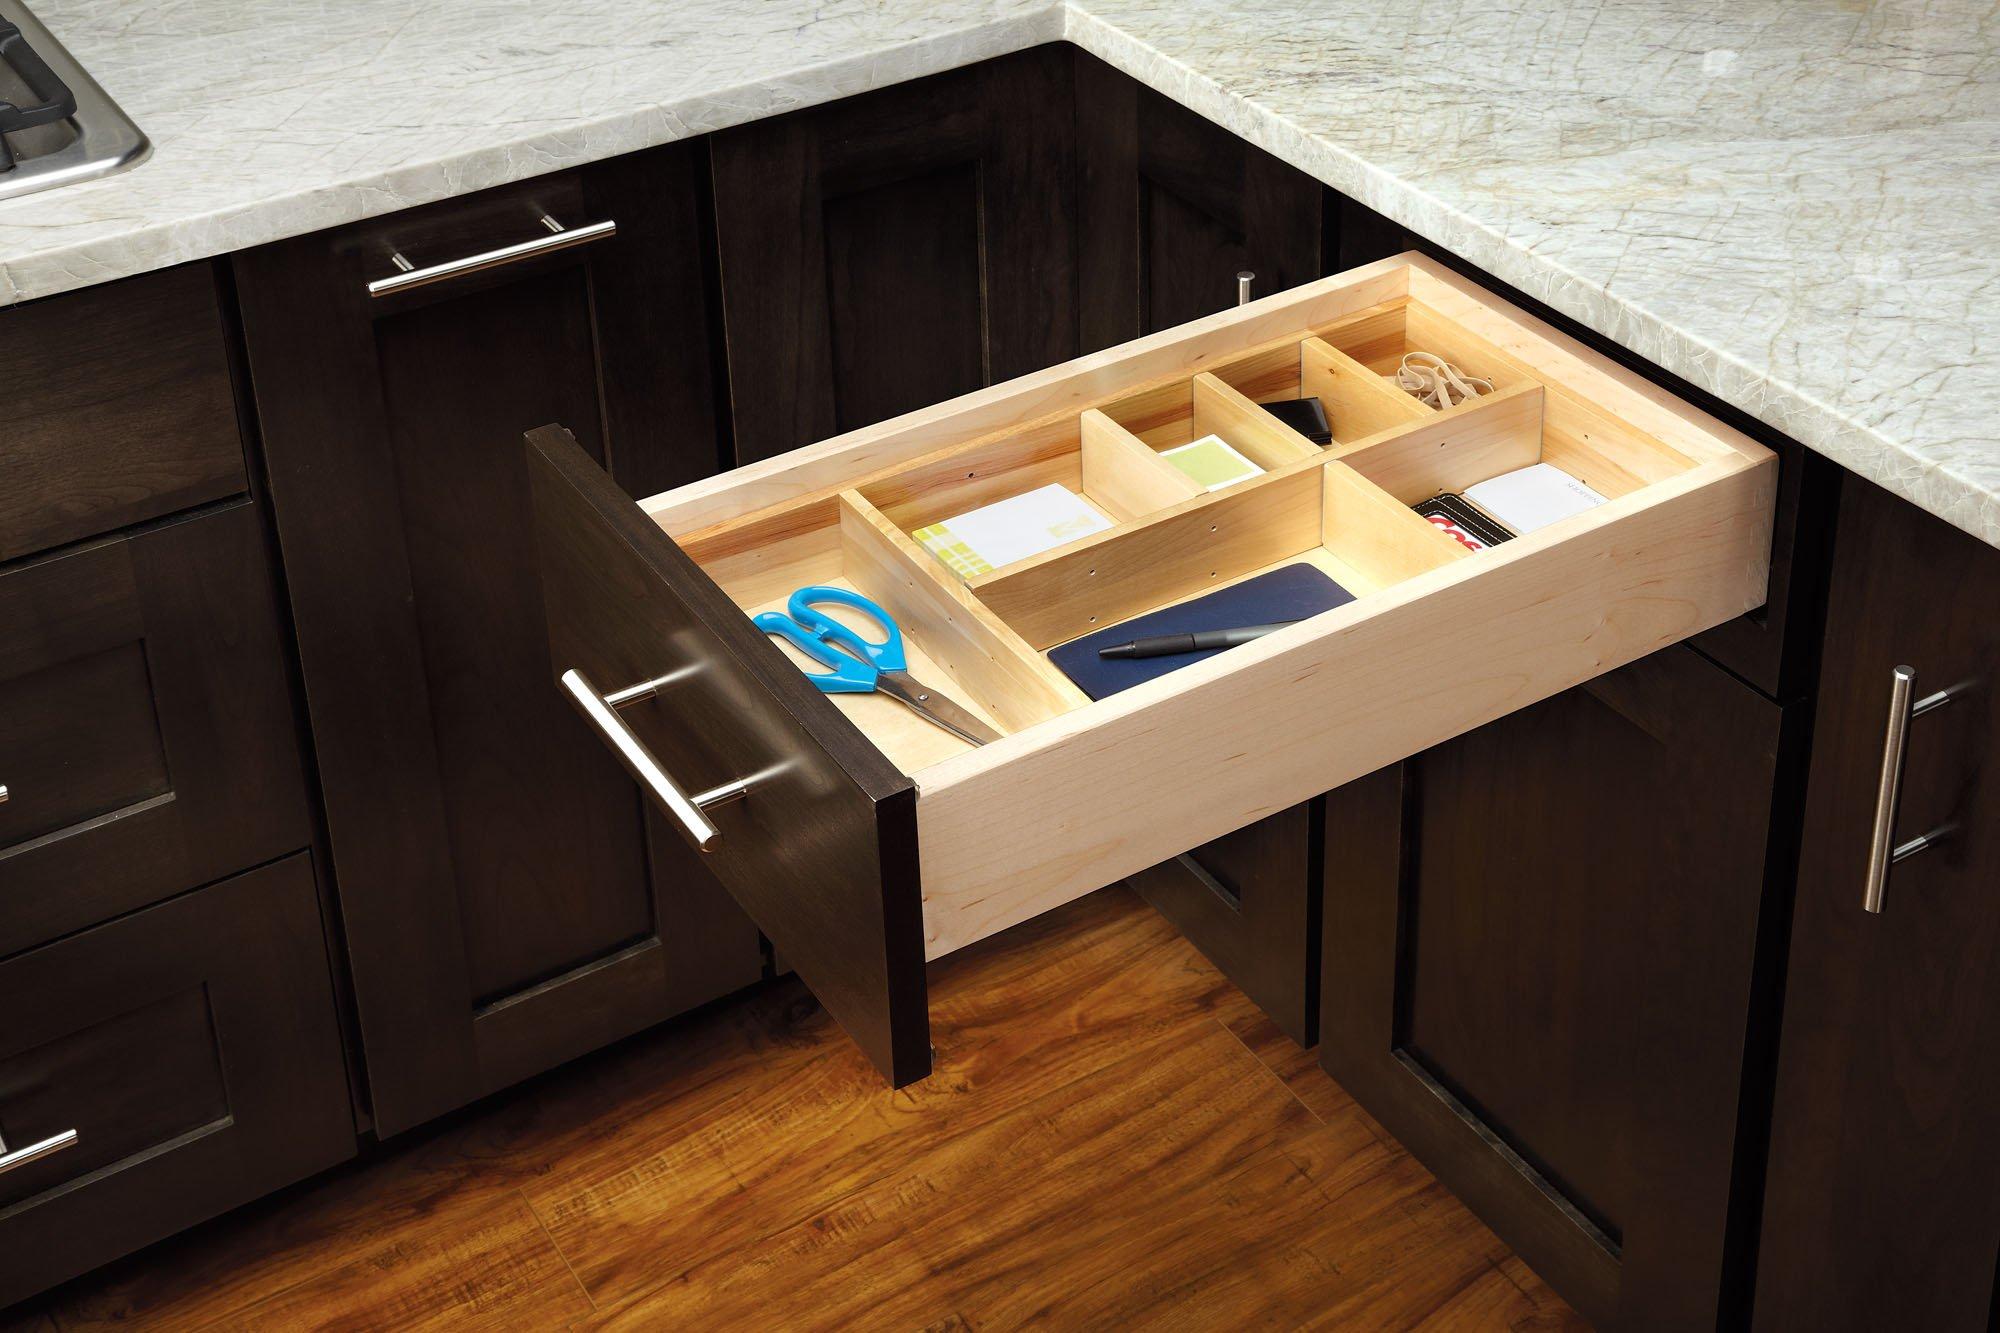 Rev-A-Shelf - LD-4CT15-1 - Small Adjustable Wood Drawer Organizer Kit